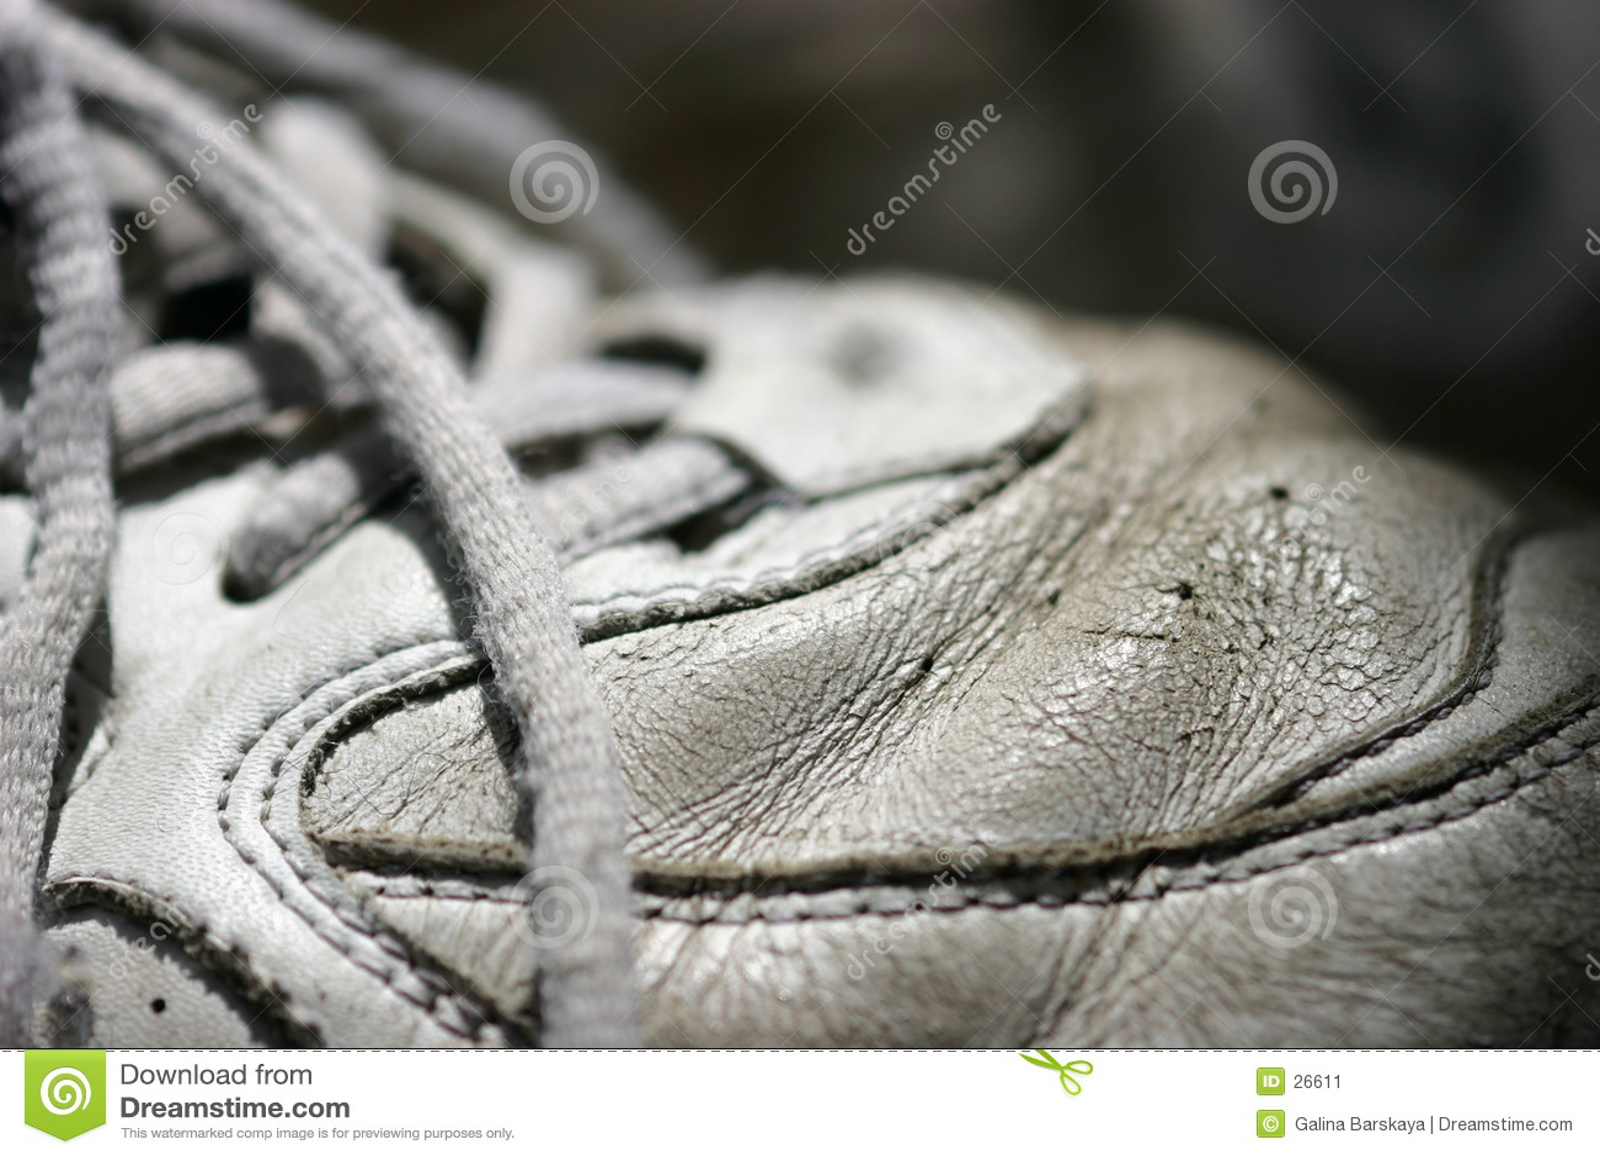 Alter Tennis Schuh